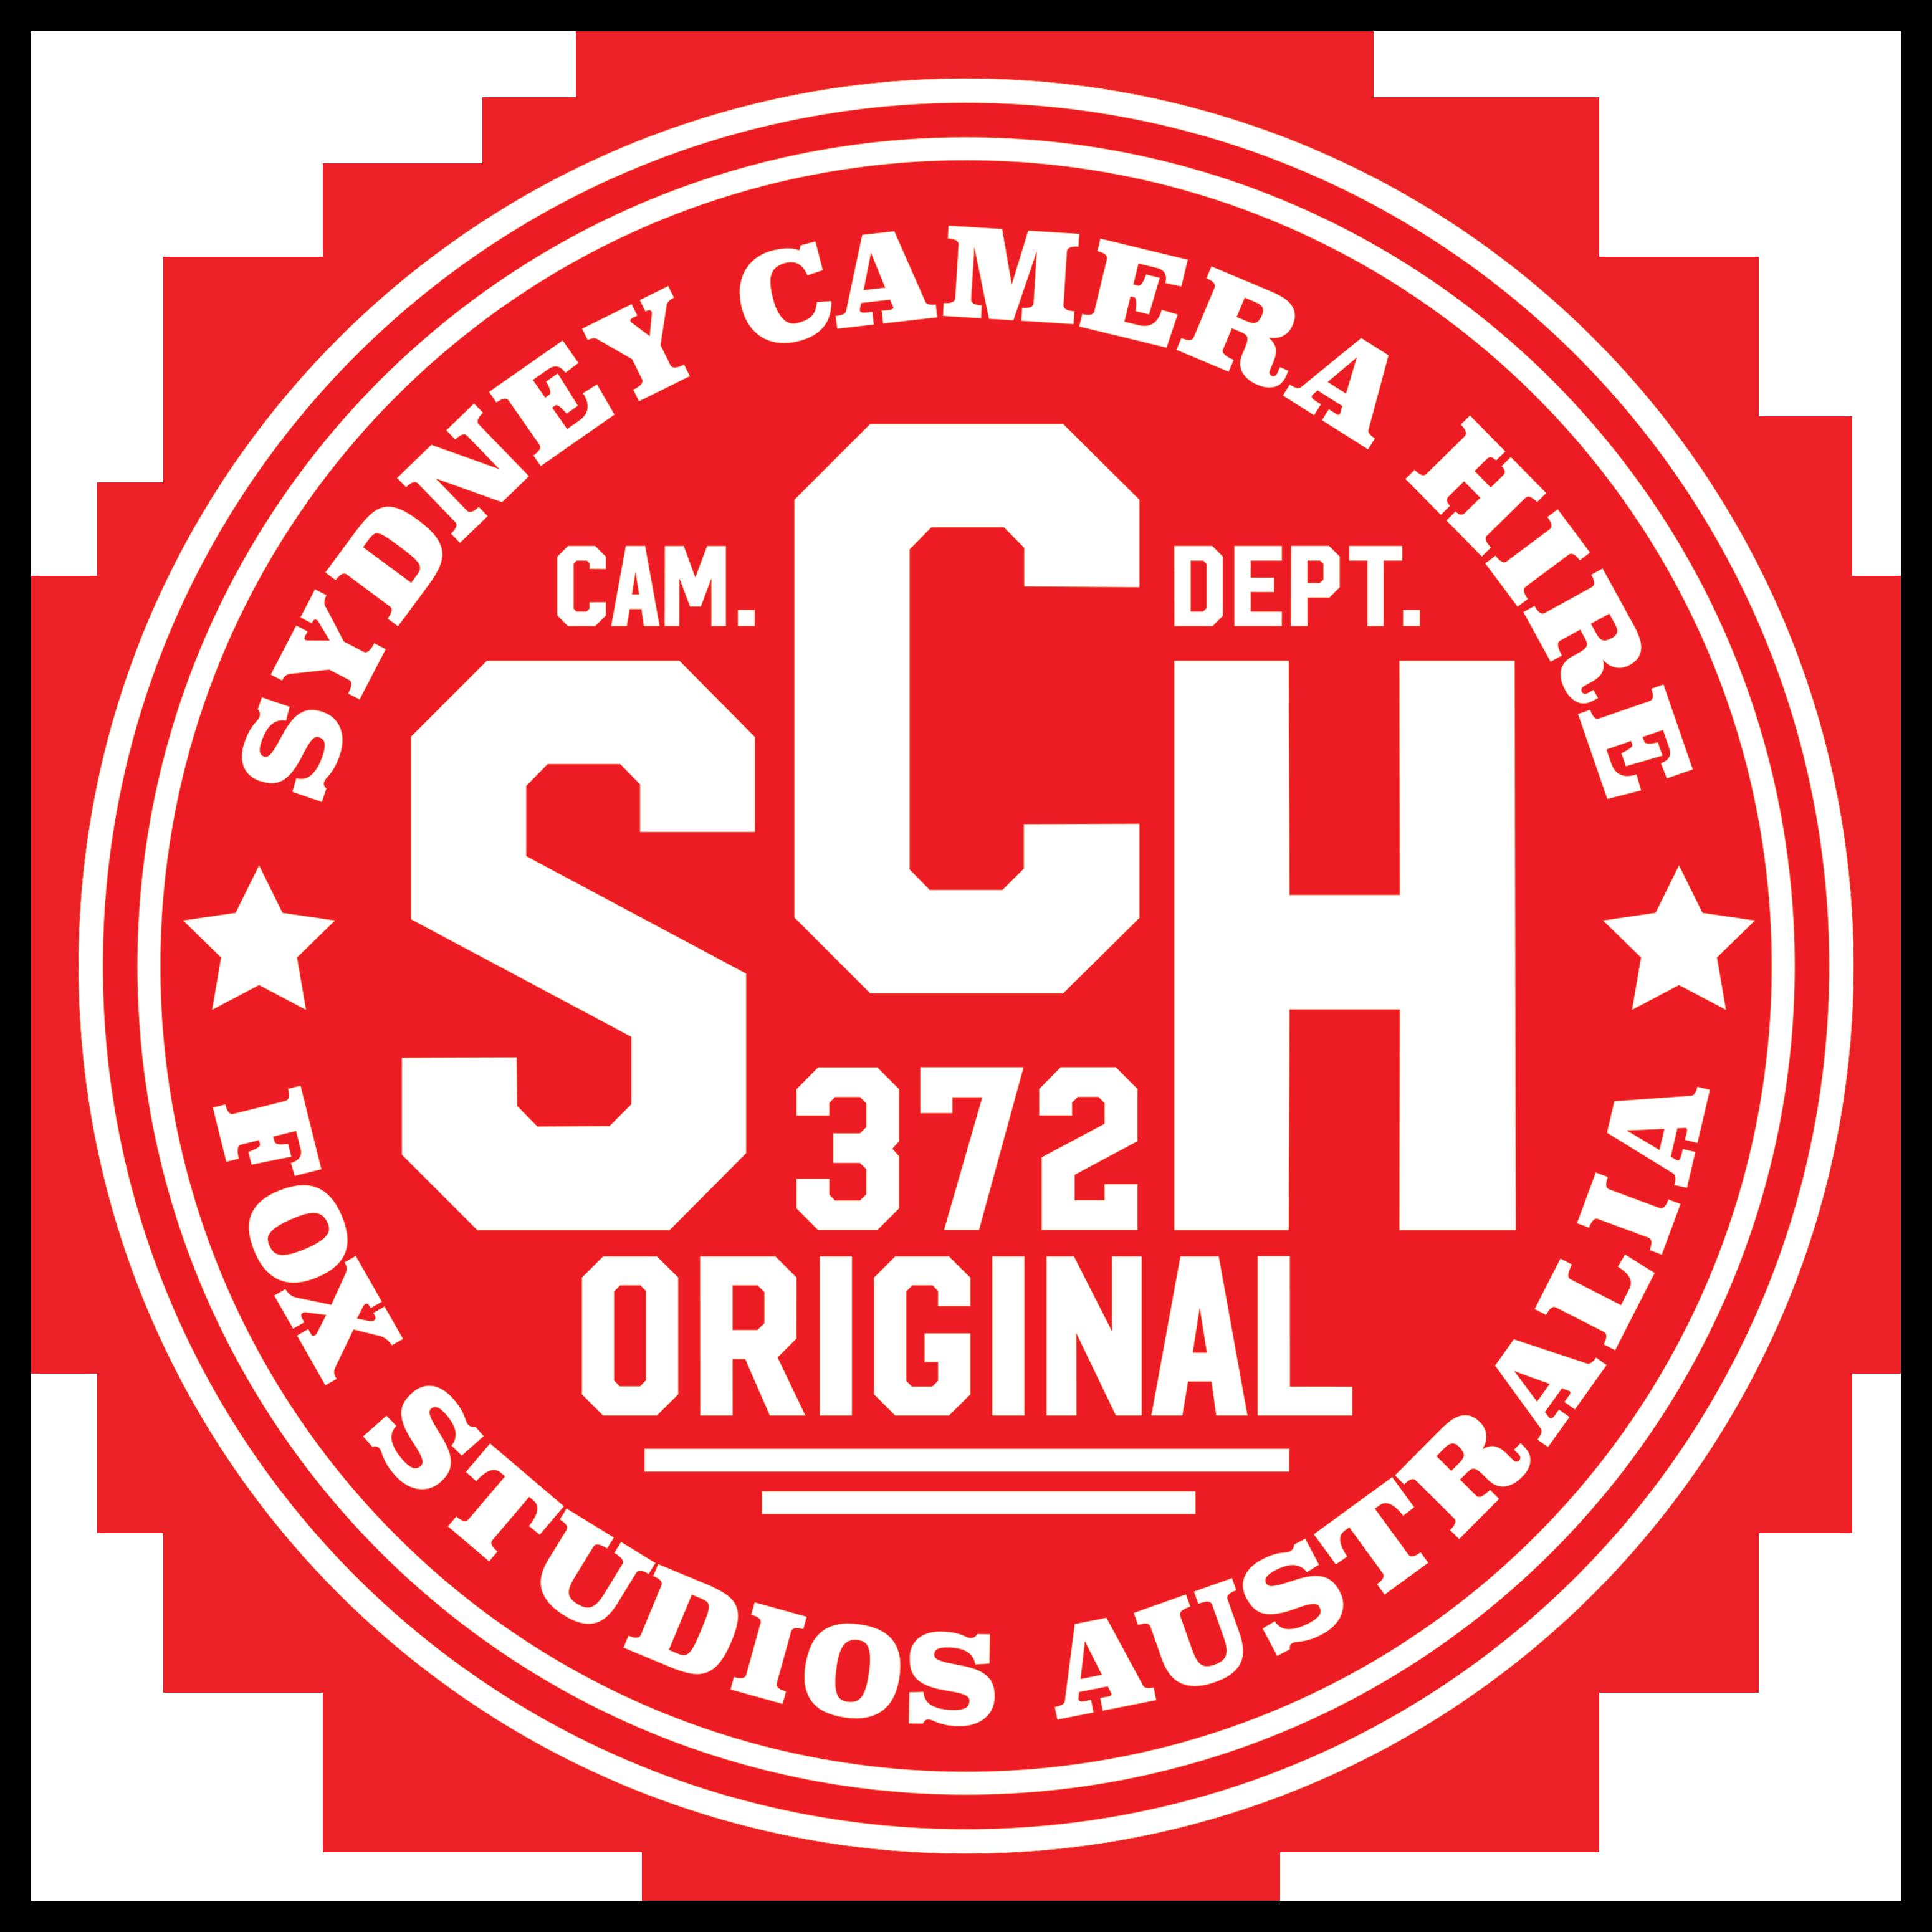 Sydney Camera Hire